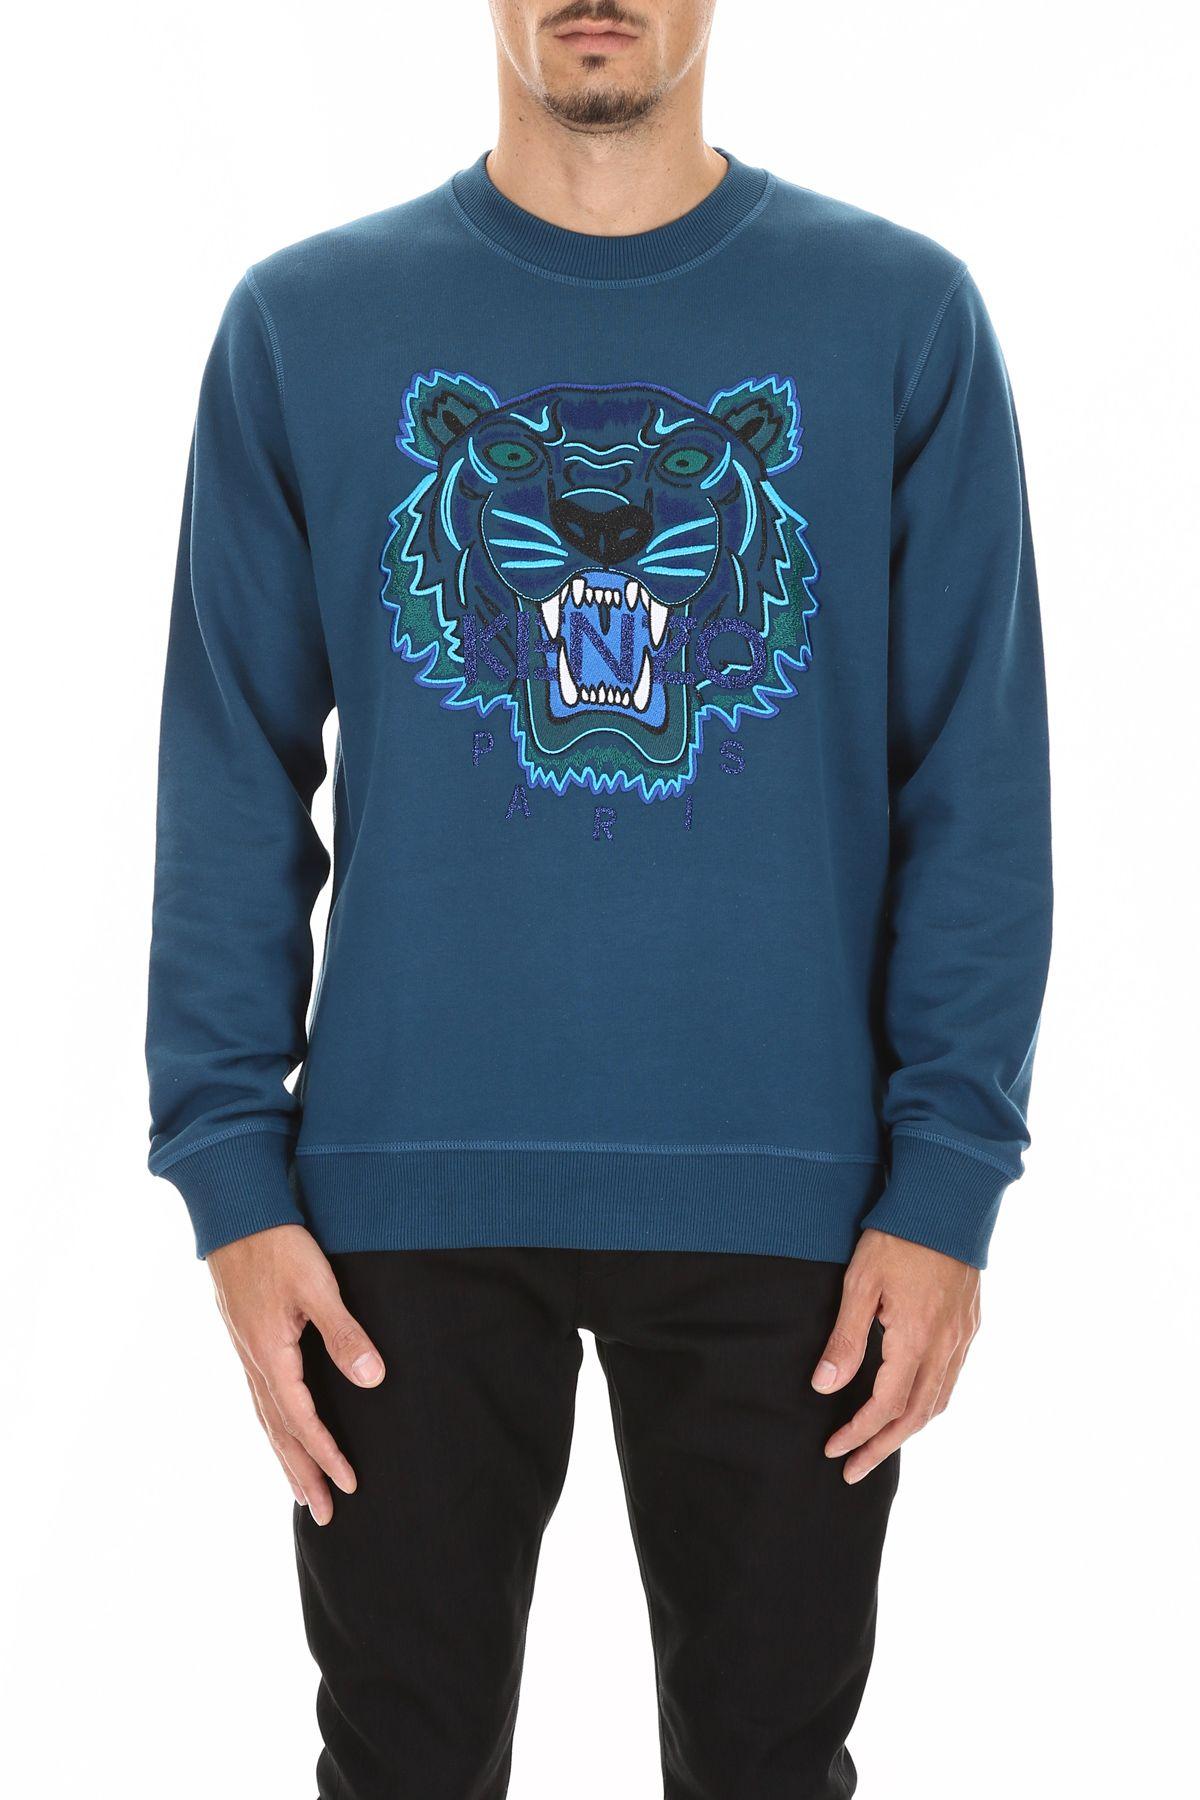 8af86647dc3bb6 italist | Best price in the market for Kenzo Kenzo Tiger Sweatshirt ...